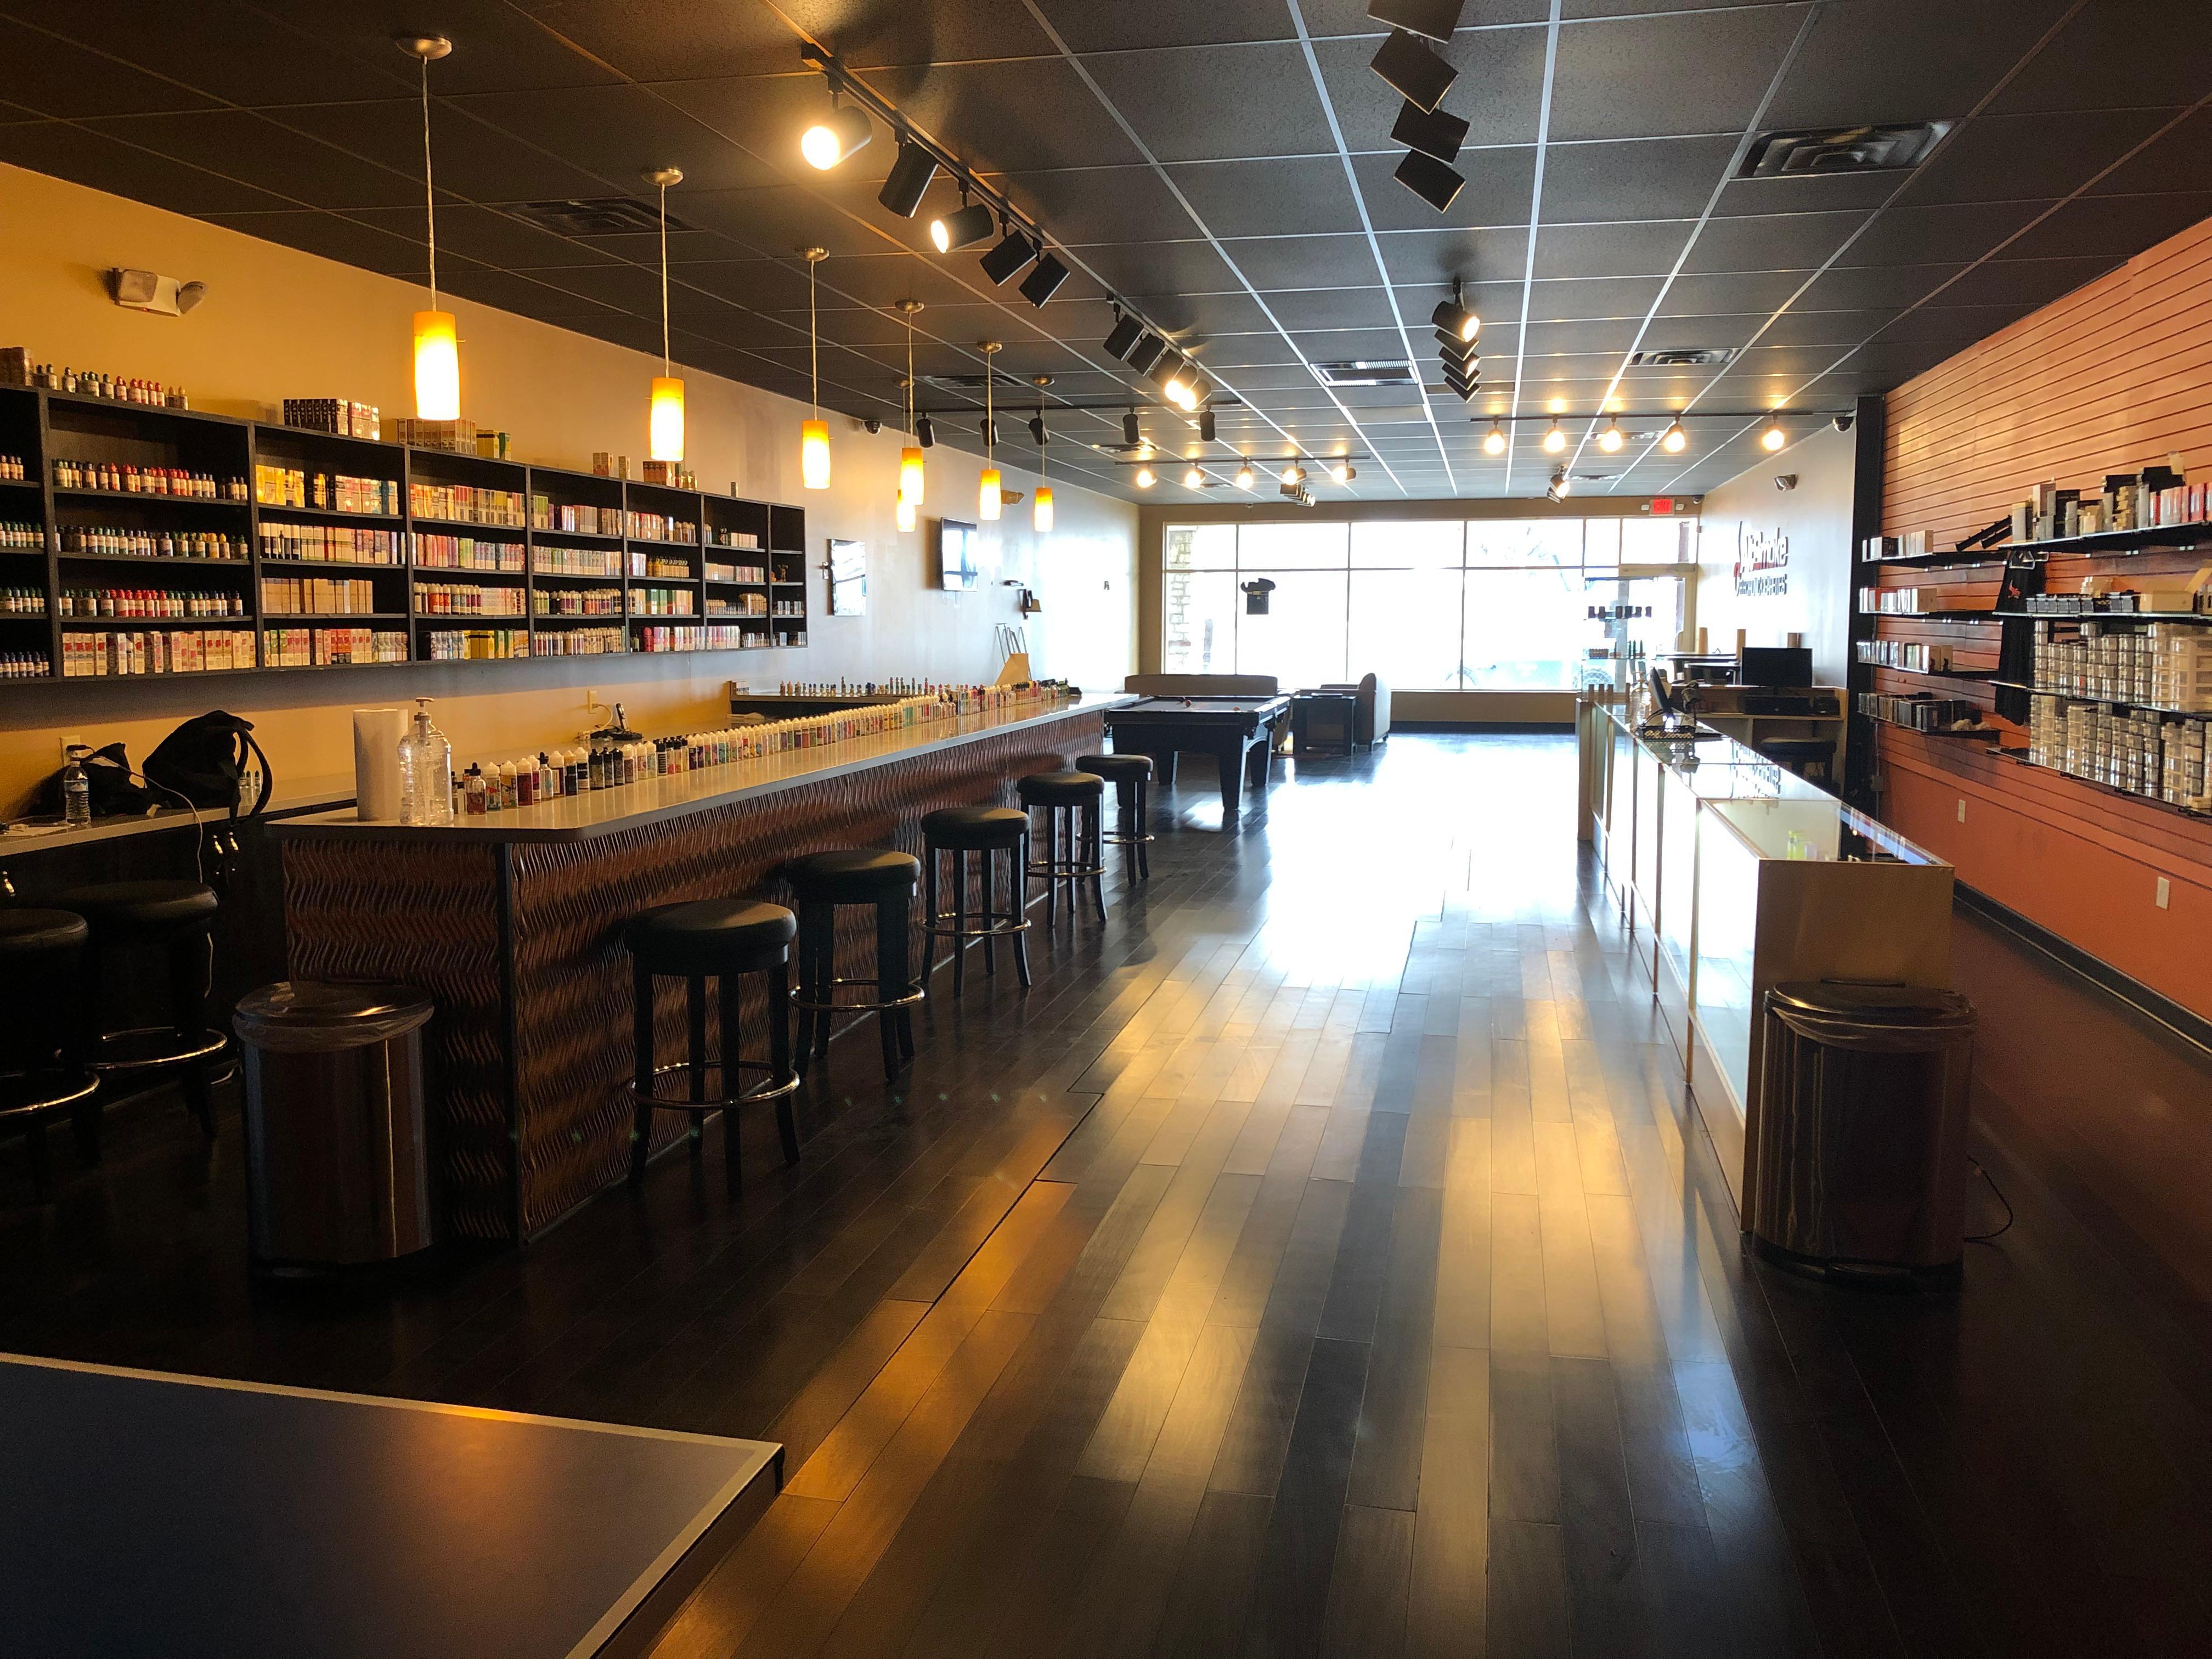 AltSmoke - Smoke Shop - Gahanna, OH 43230